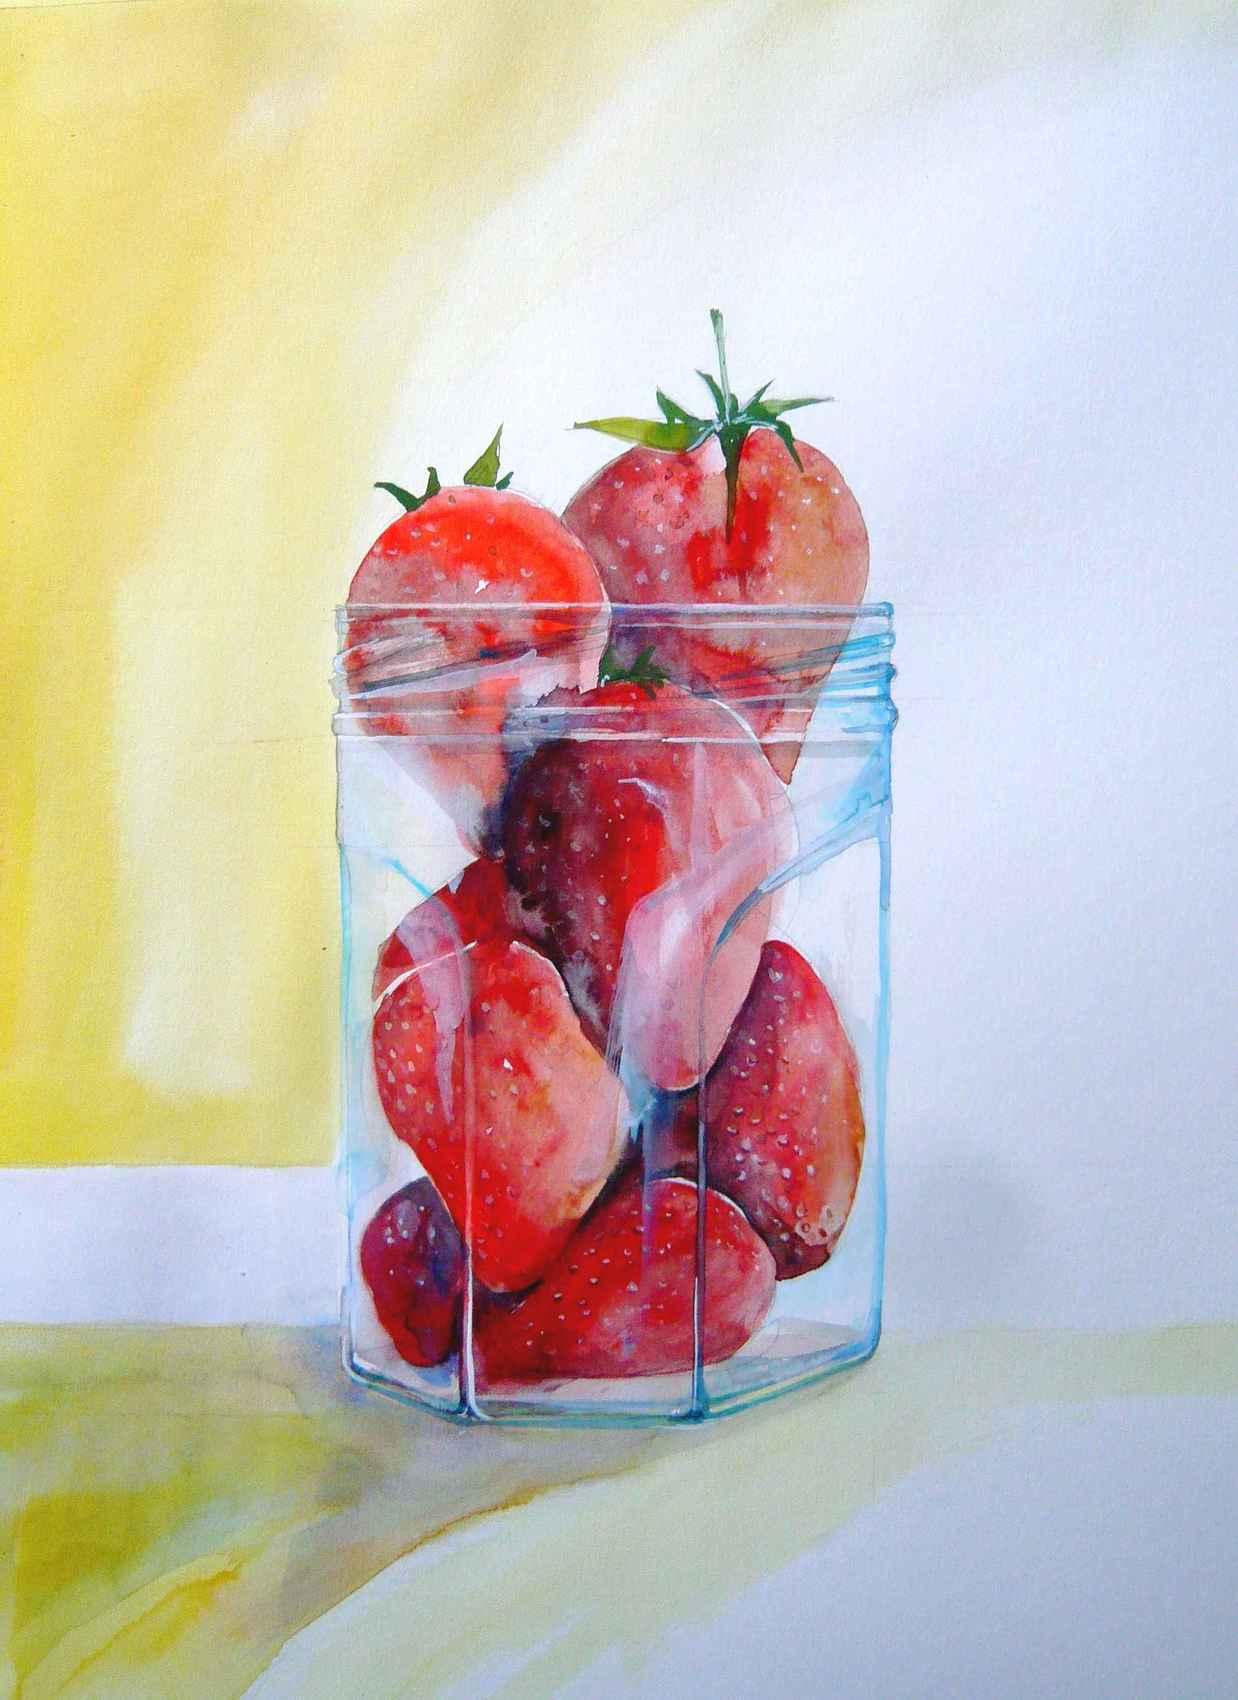 Peinture ramene ta fraise - Ramene ta fraise ...